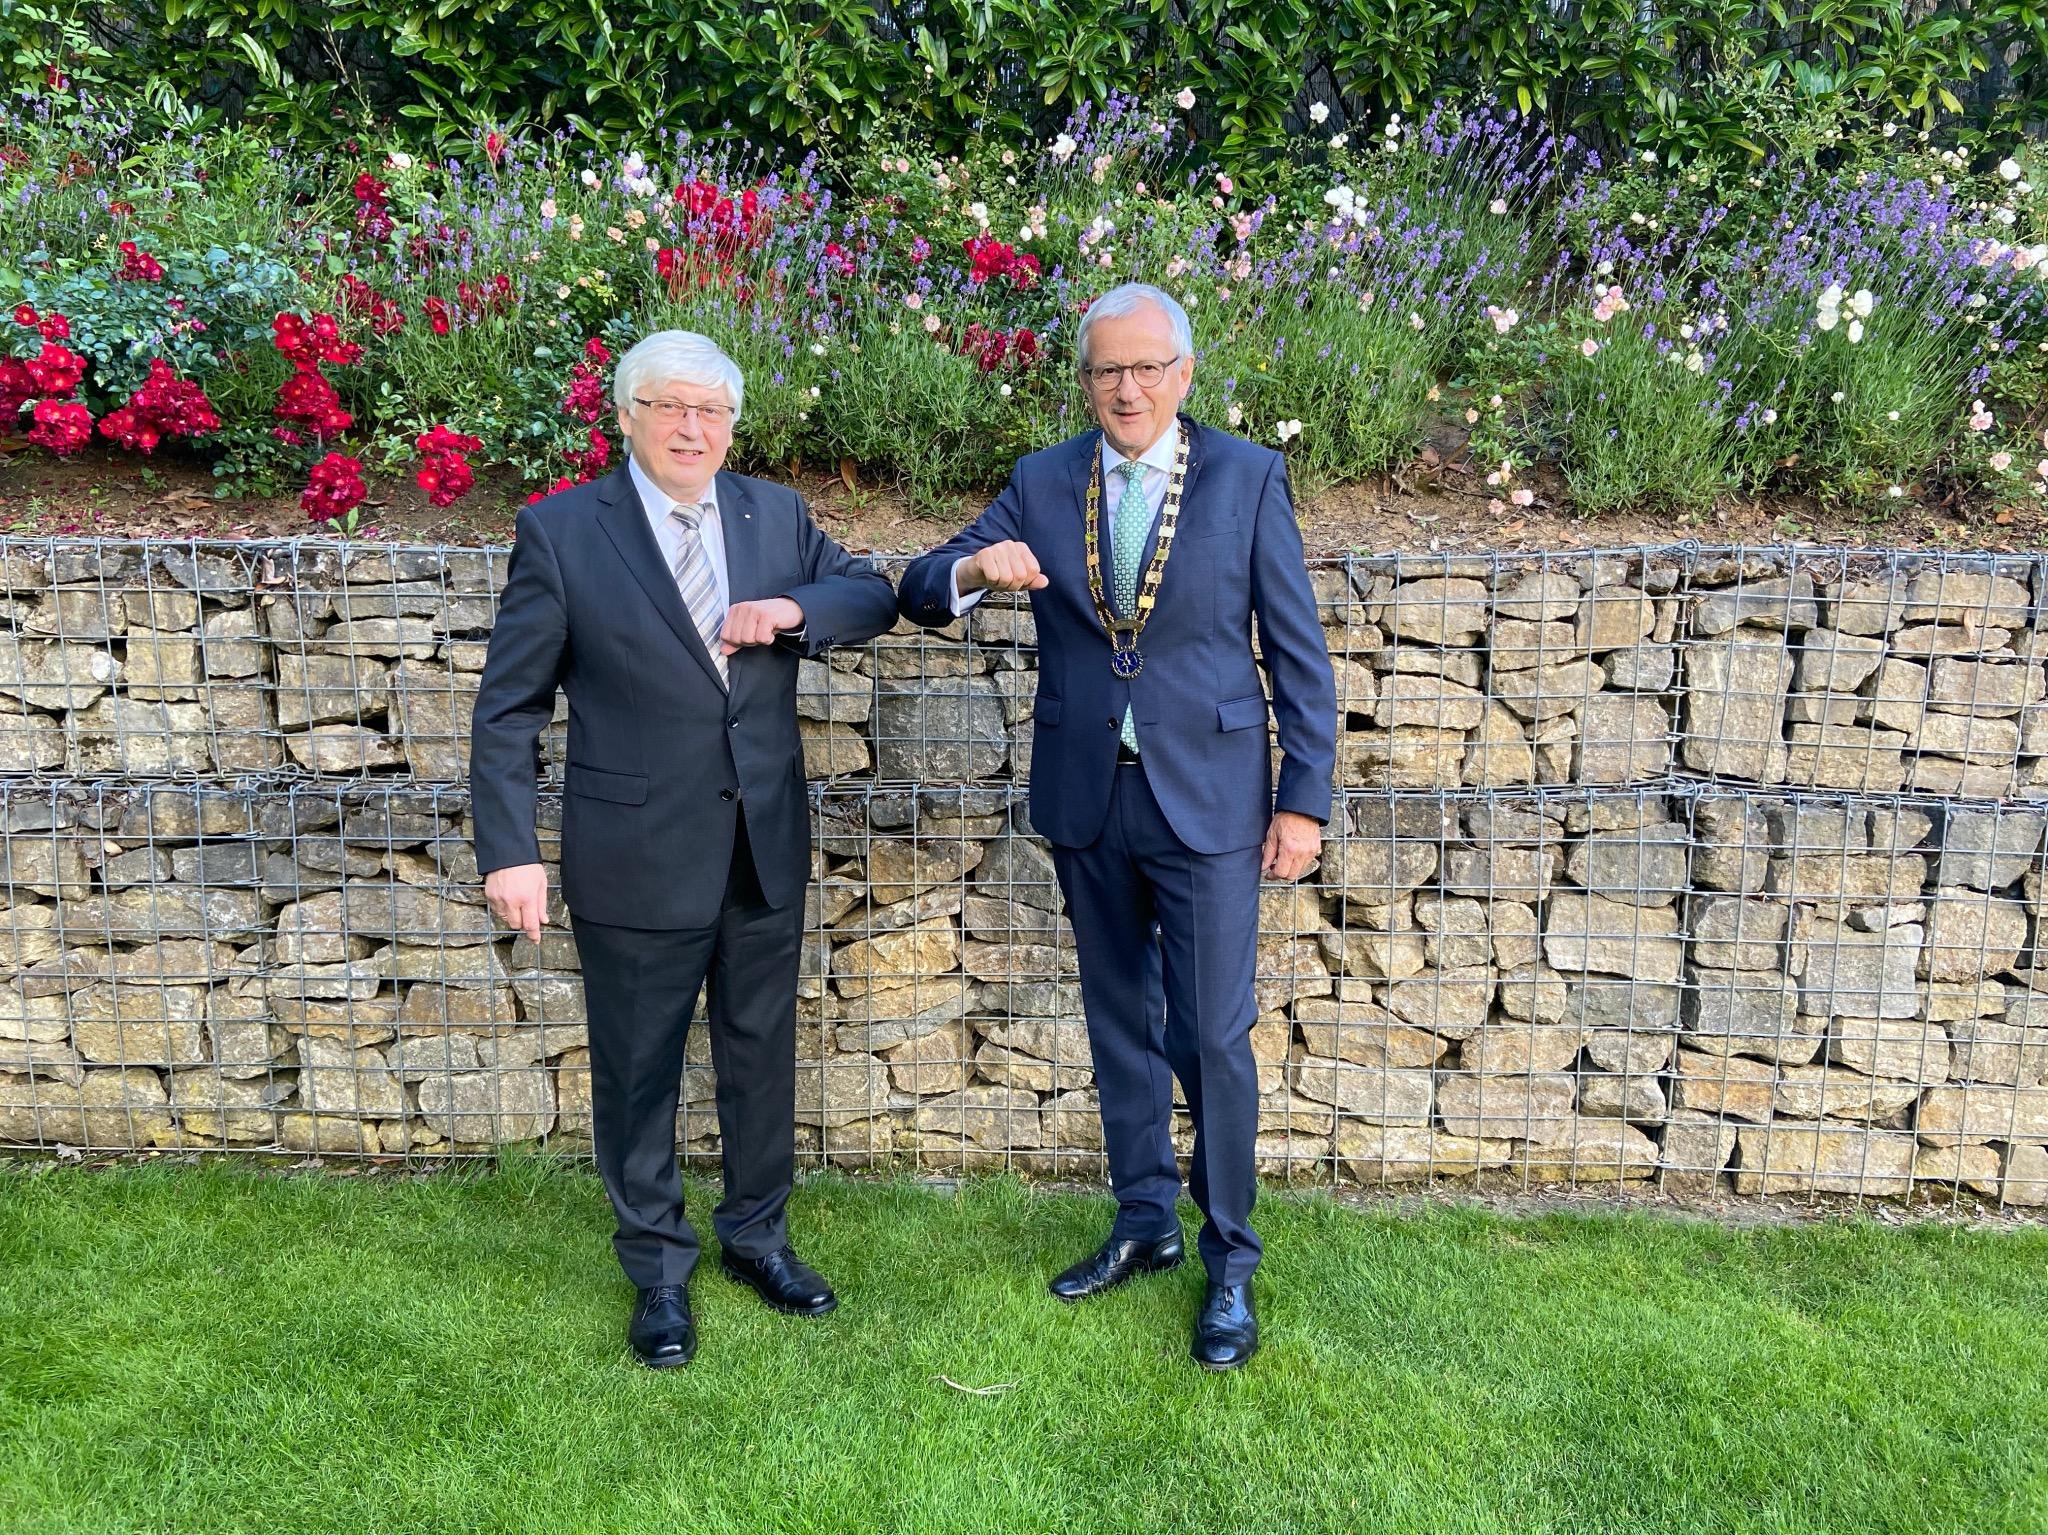 Prof. Dr. Friedhelm Brusniak (links) übergibt die Amtskette an den neuen Präsidenten des Rotary-Club Würzburg Residenz, Prof. Dr. med. Ekkehard Schippers. Foto: Heike Nothaft